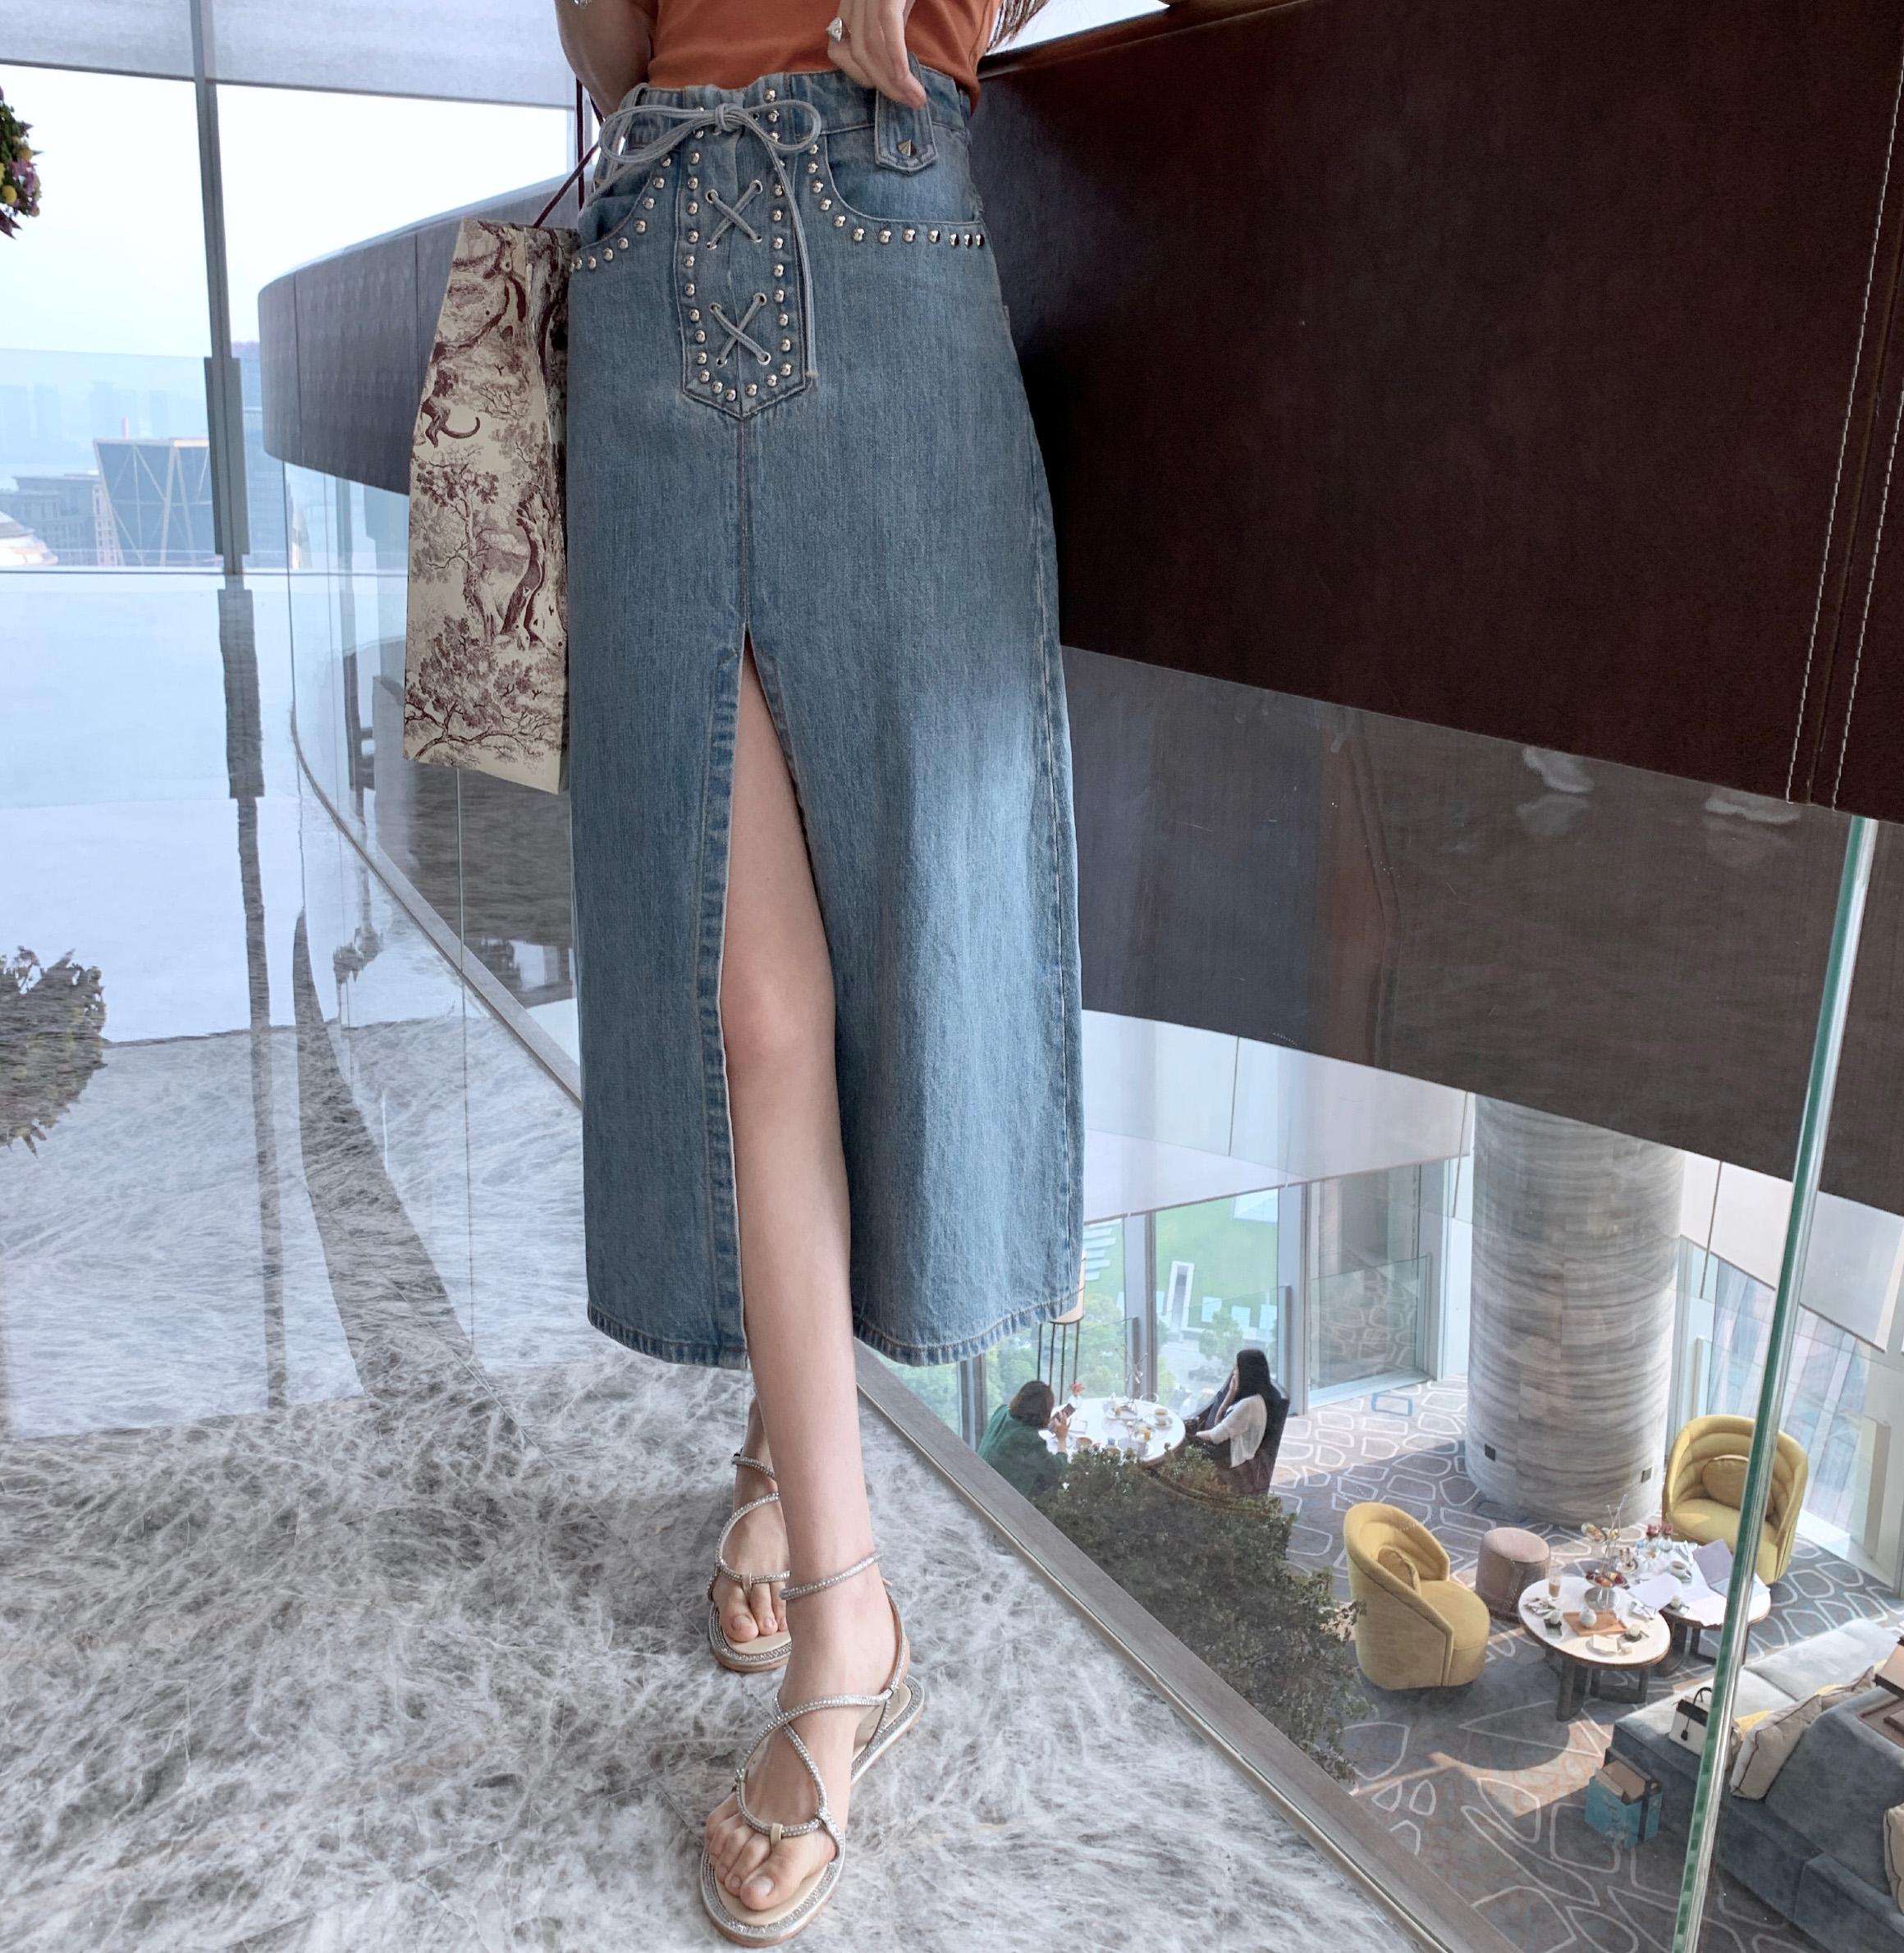 FBB李明萱2019夏季新款铆钉高腰开叉牛仔半裙复古绣花半身裙女